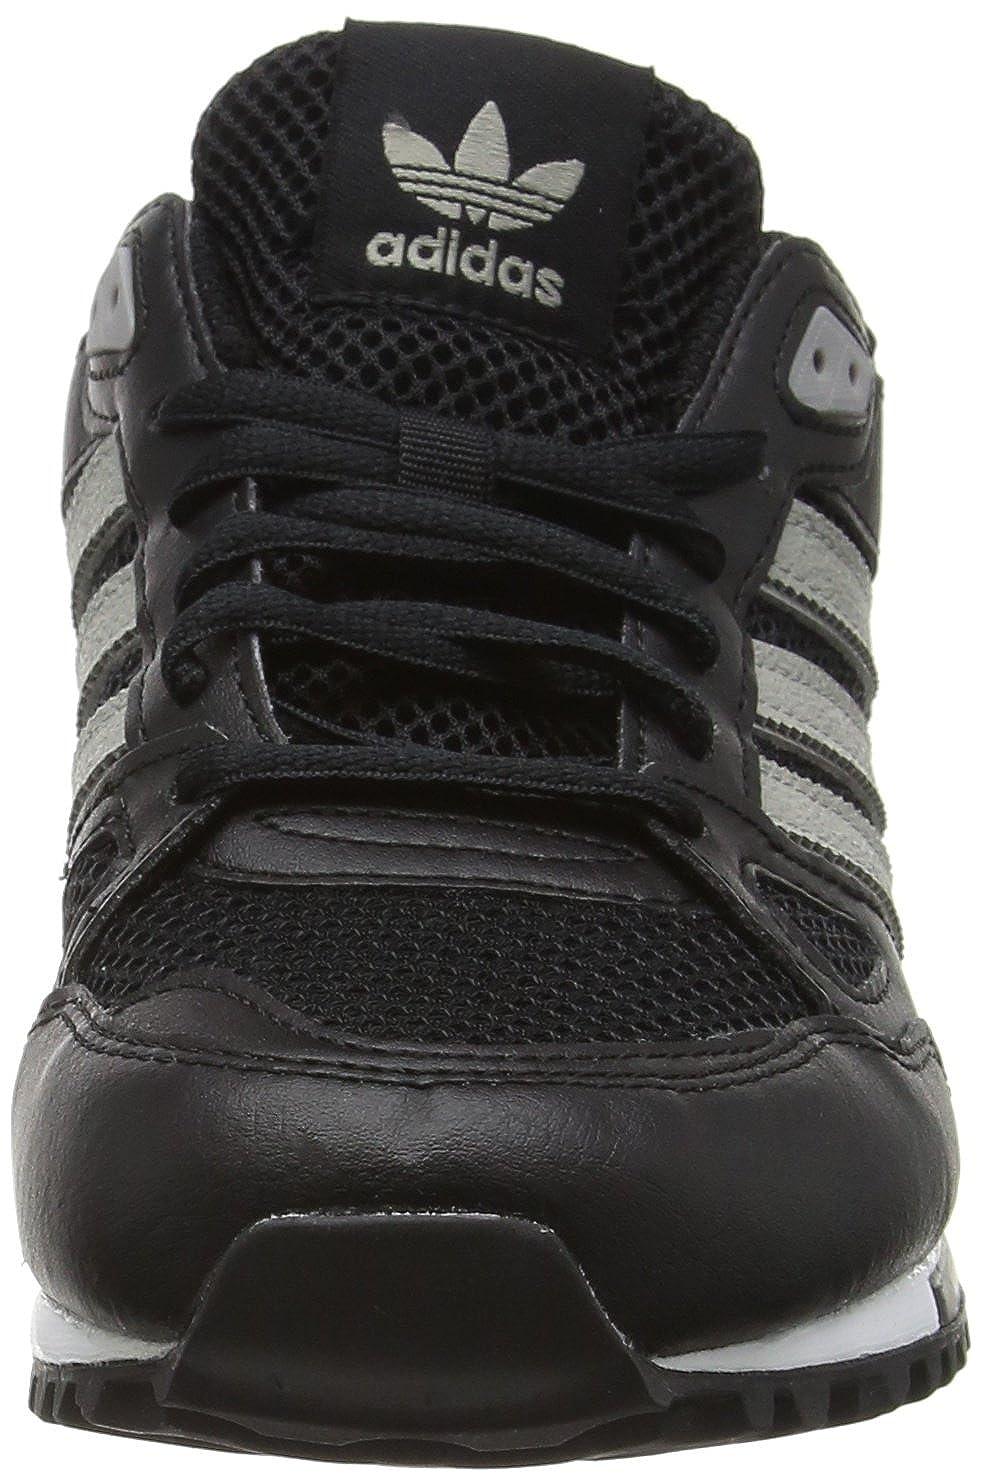 hot sale online d6ead 3e7bd adidas Zx 750, Scarpe da Corsa Uomo, Nero (Core Black Mgh Solid Grey Mgh  Solid Grey), 36 EU  adidas Originals  Amazon.it  Scarpe e borse